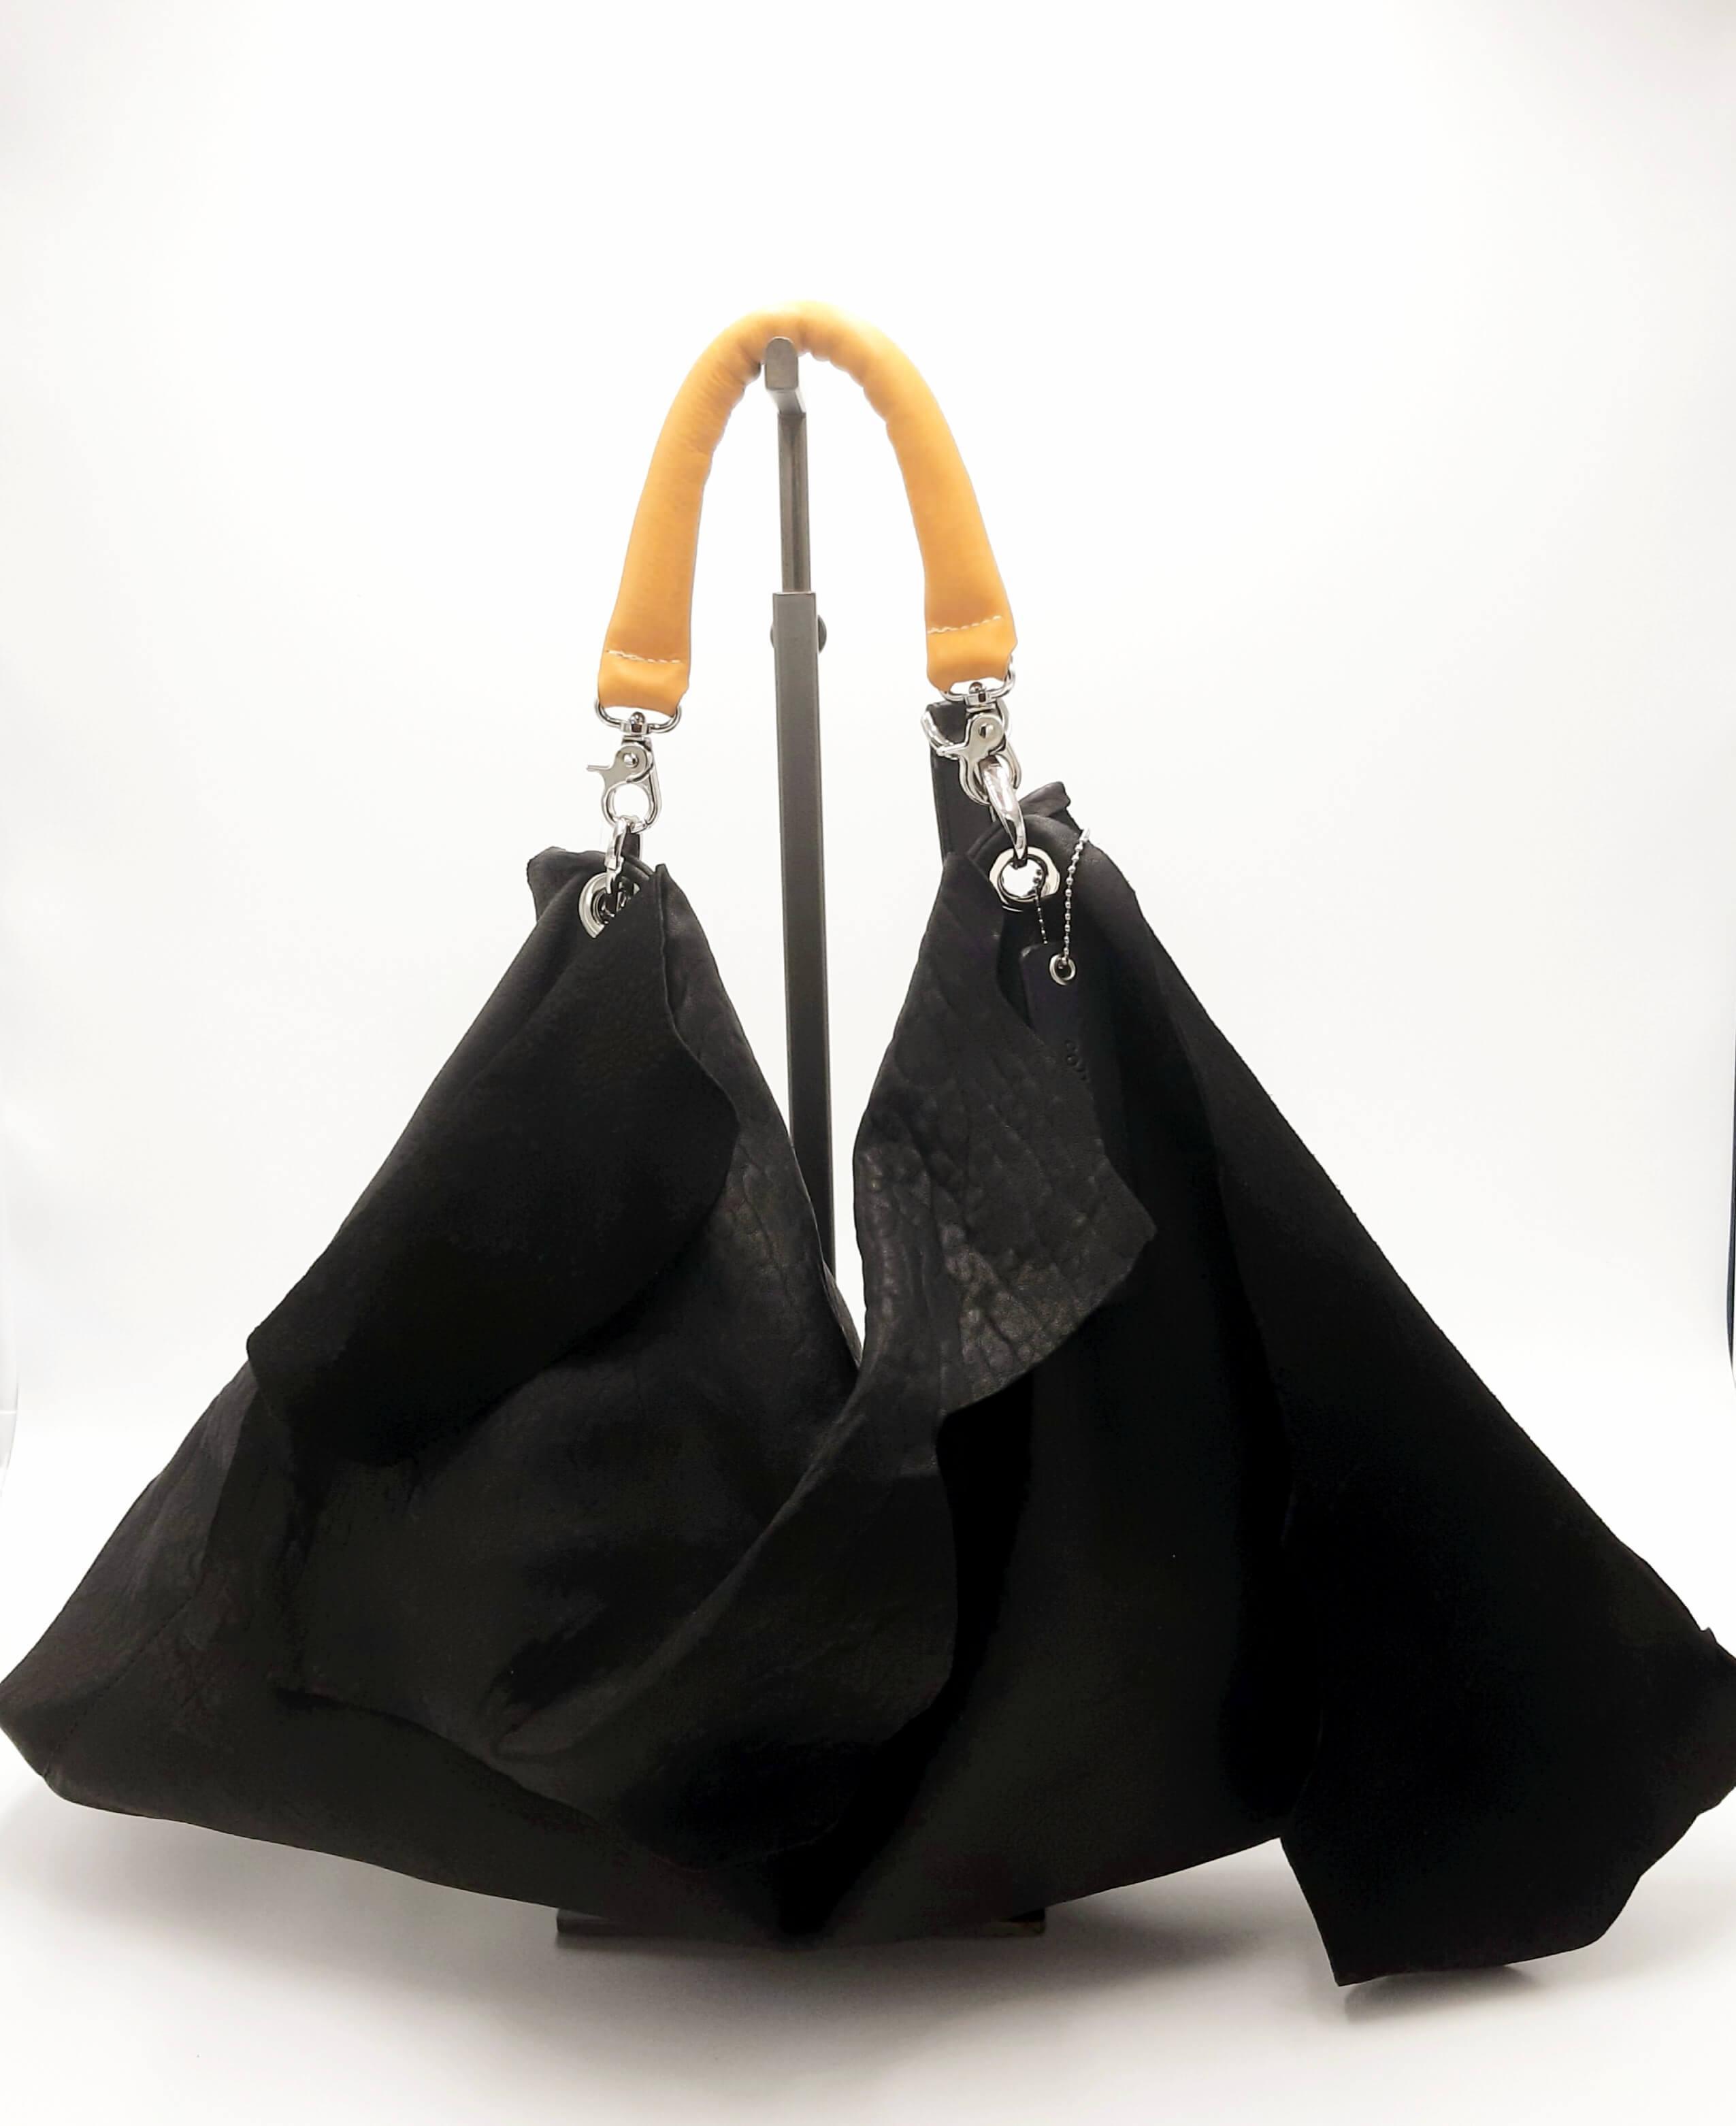 Borsa in pelle nera Collection Privée.